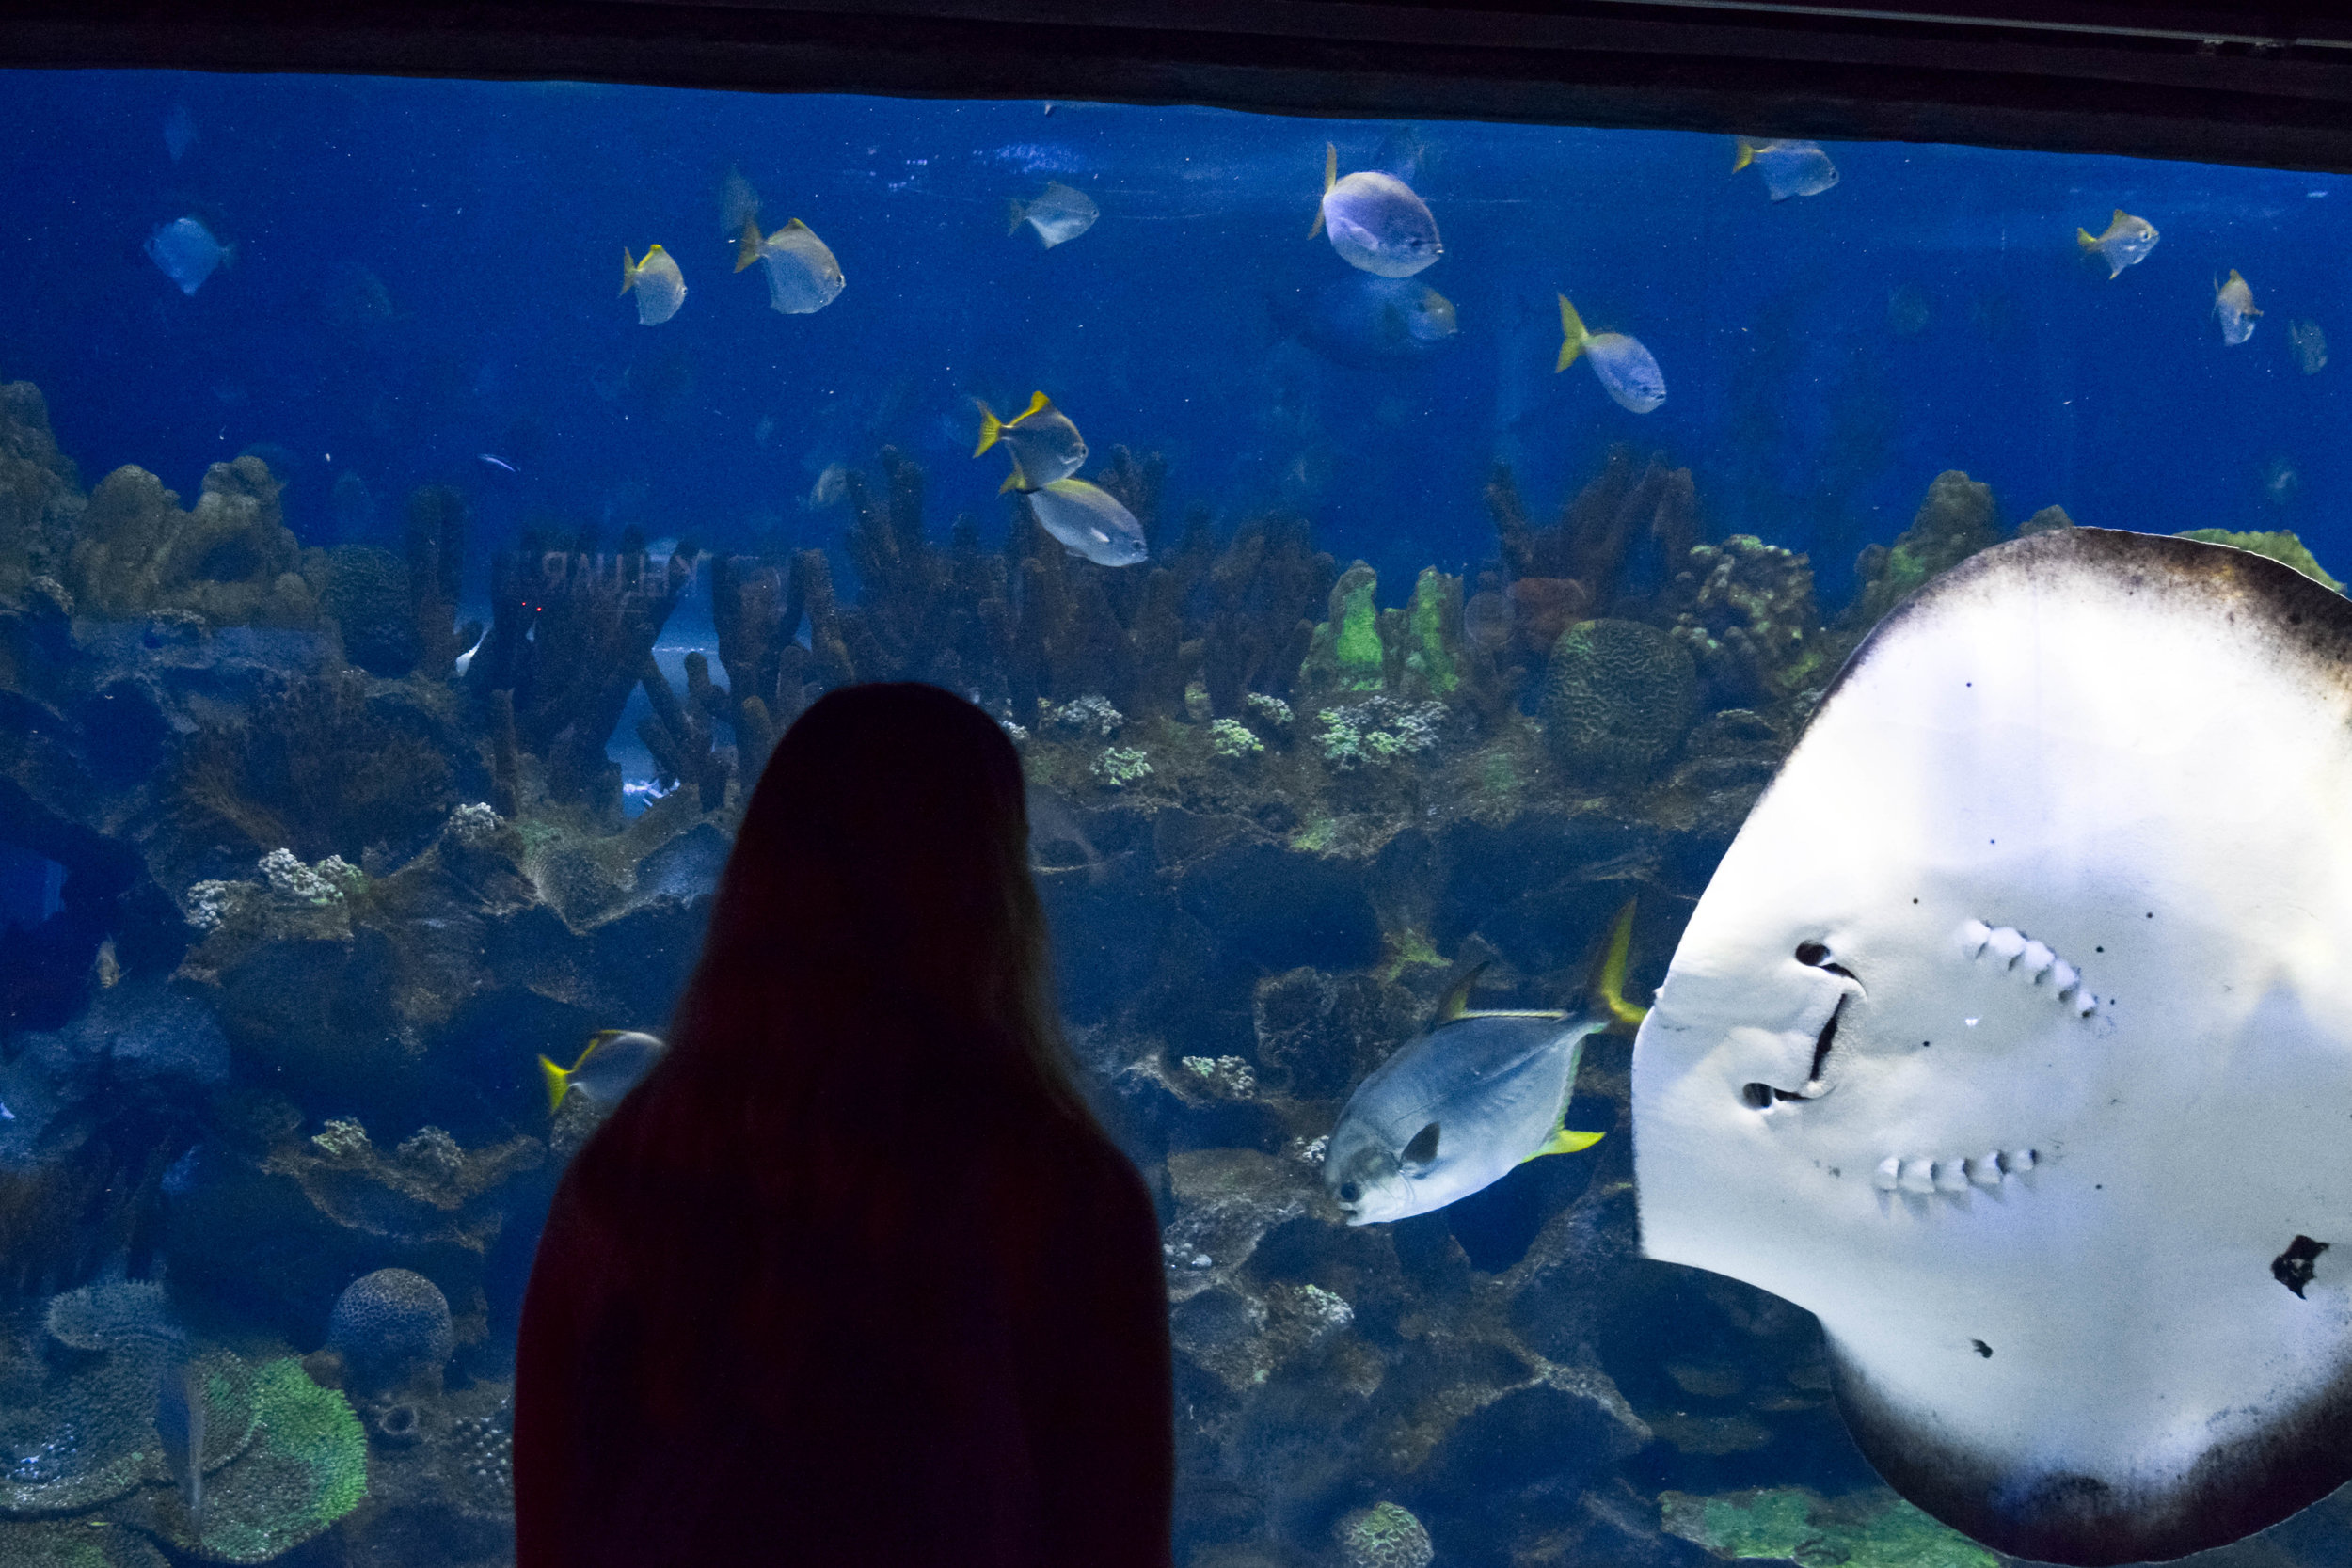 Making new friends at Aquaria KLCC.